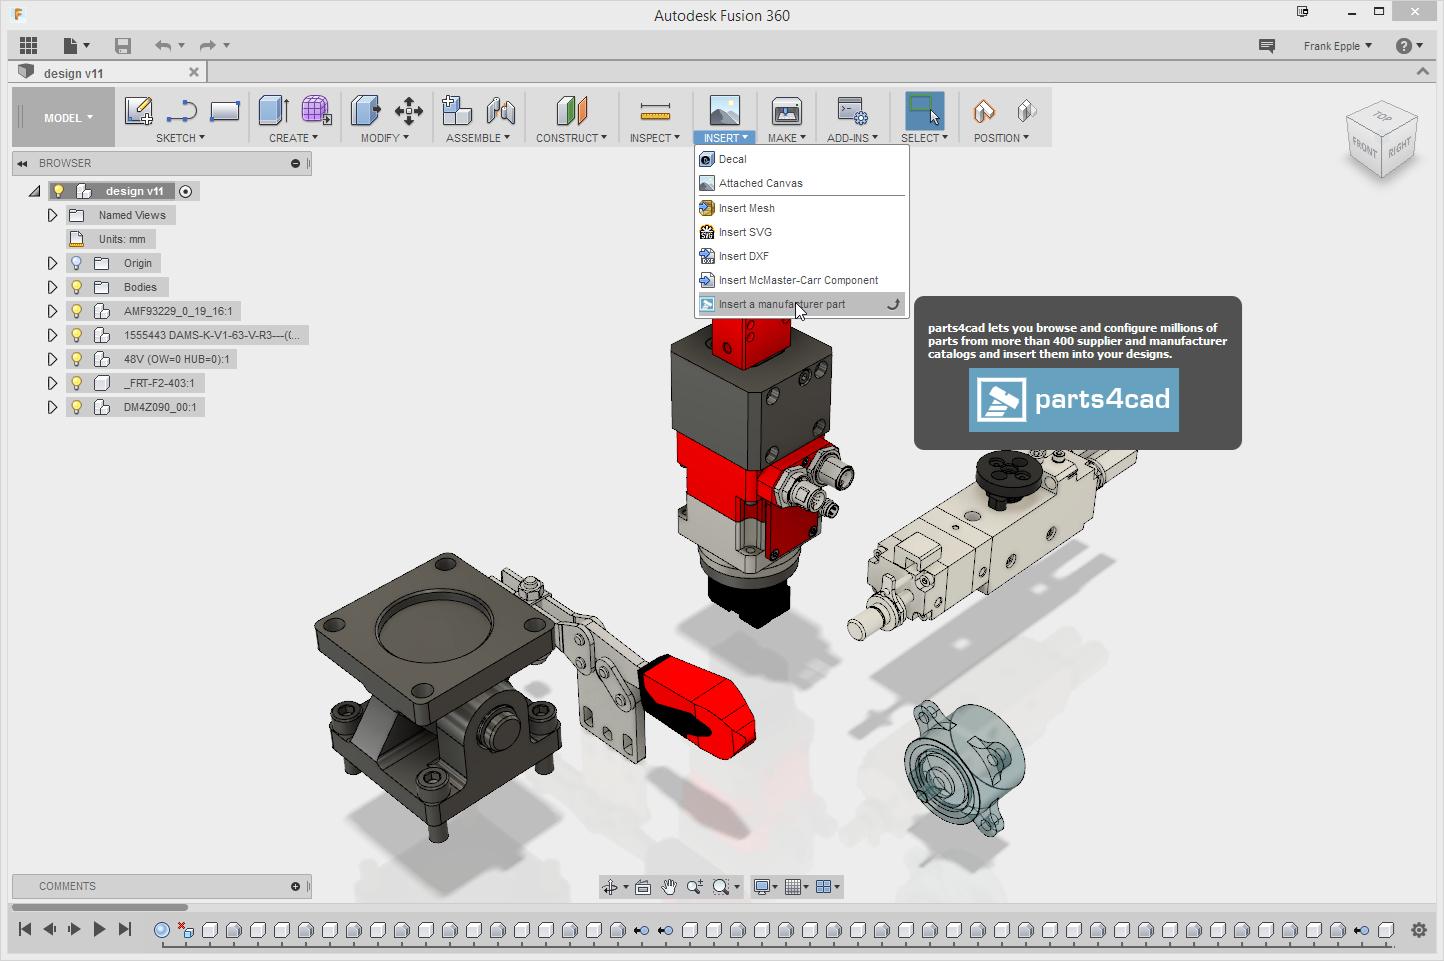 parts4cad in Autodesk Fusion 360